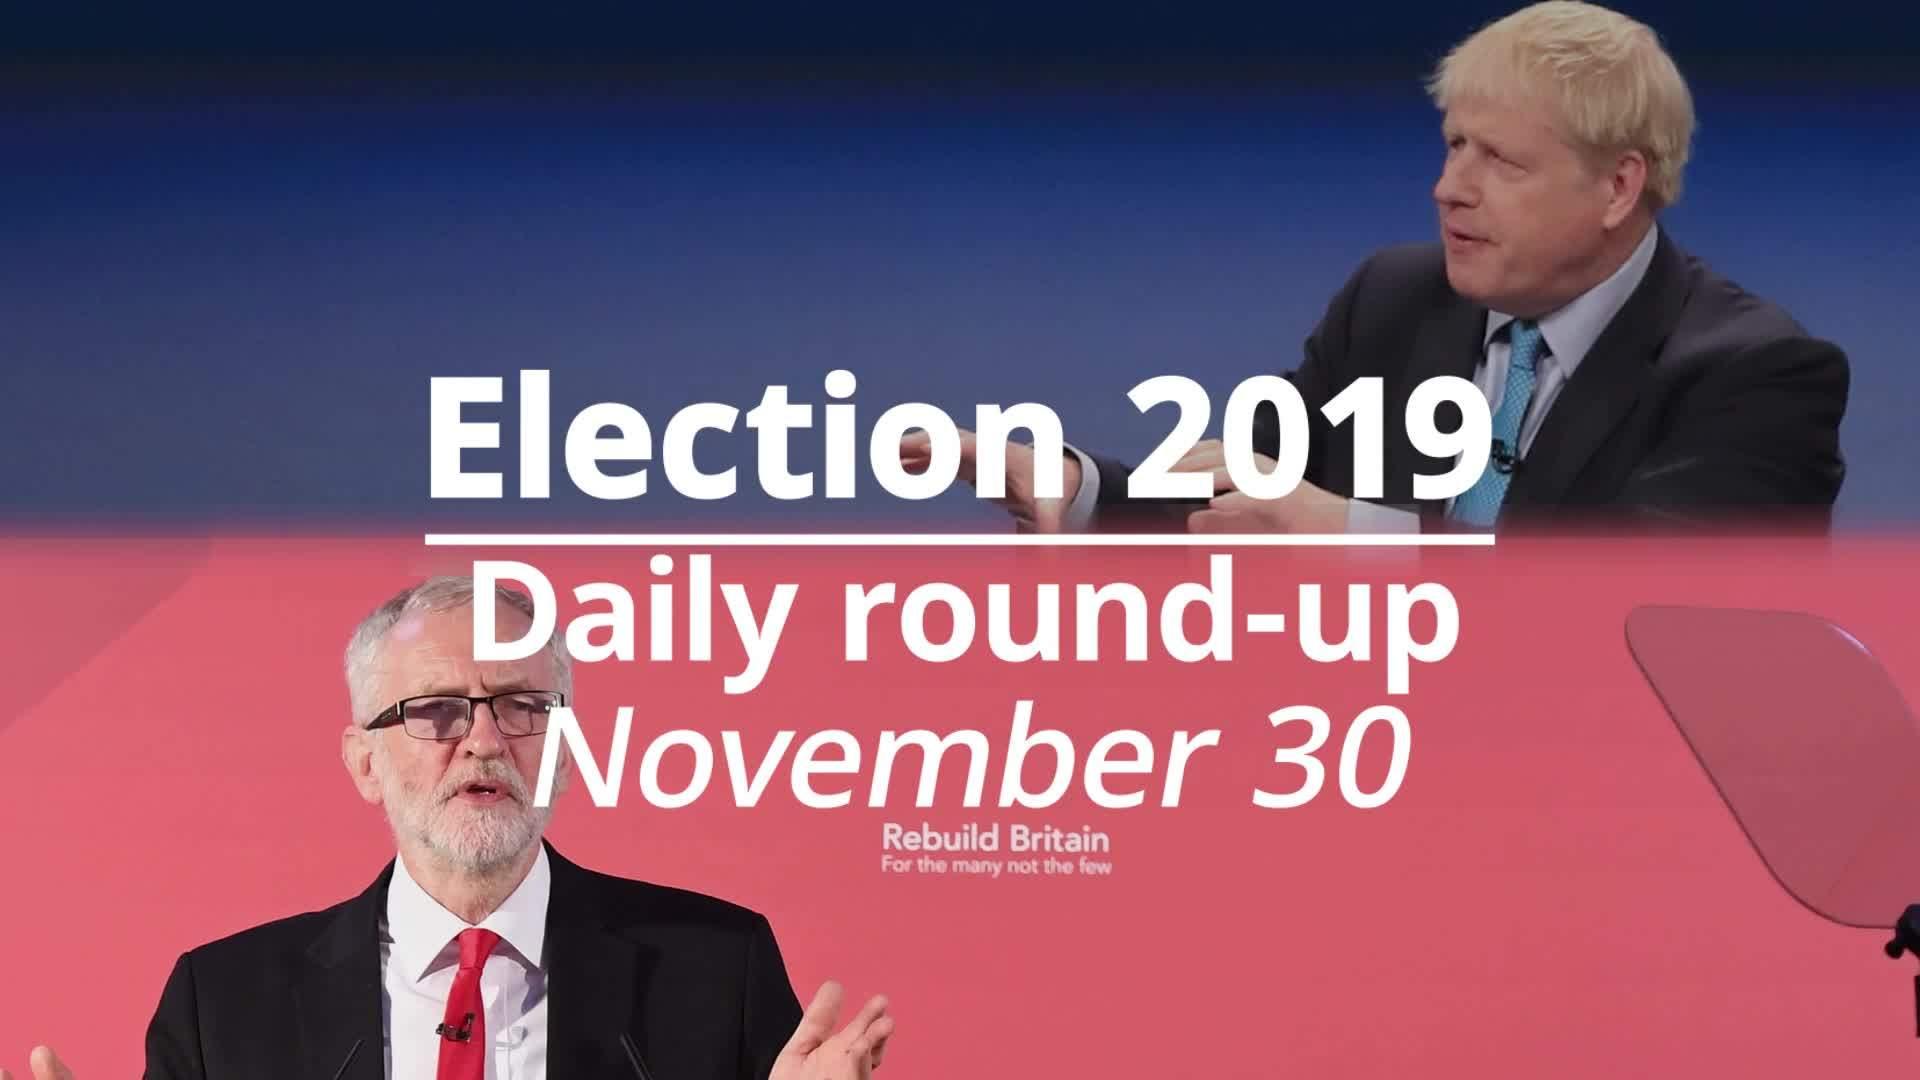 Election 2019: November 30 round-up